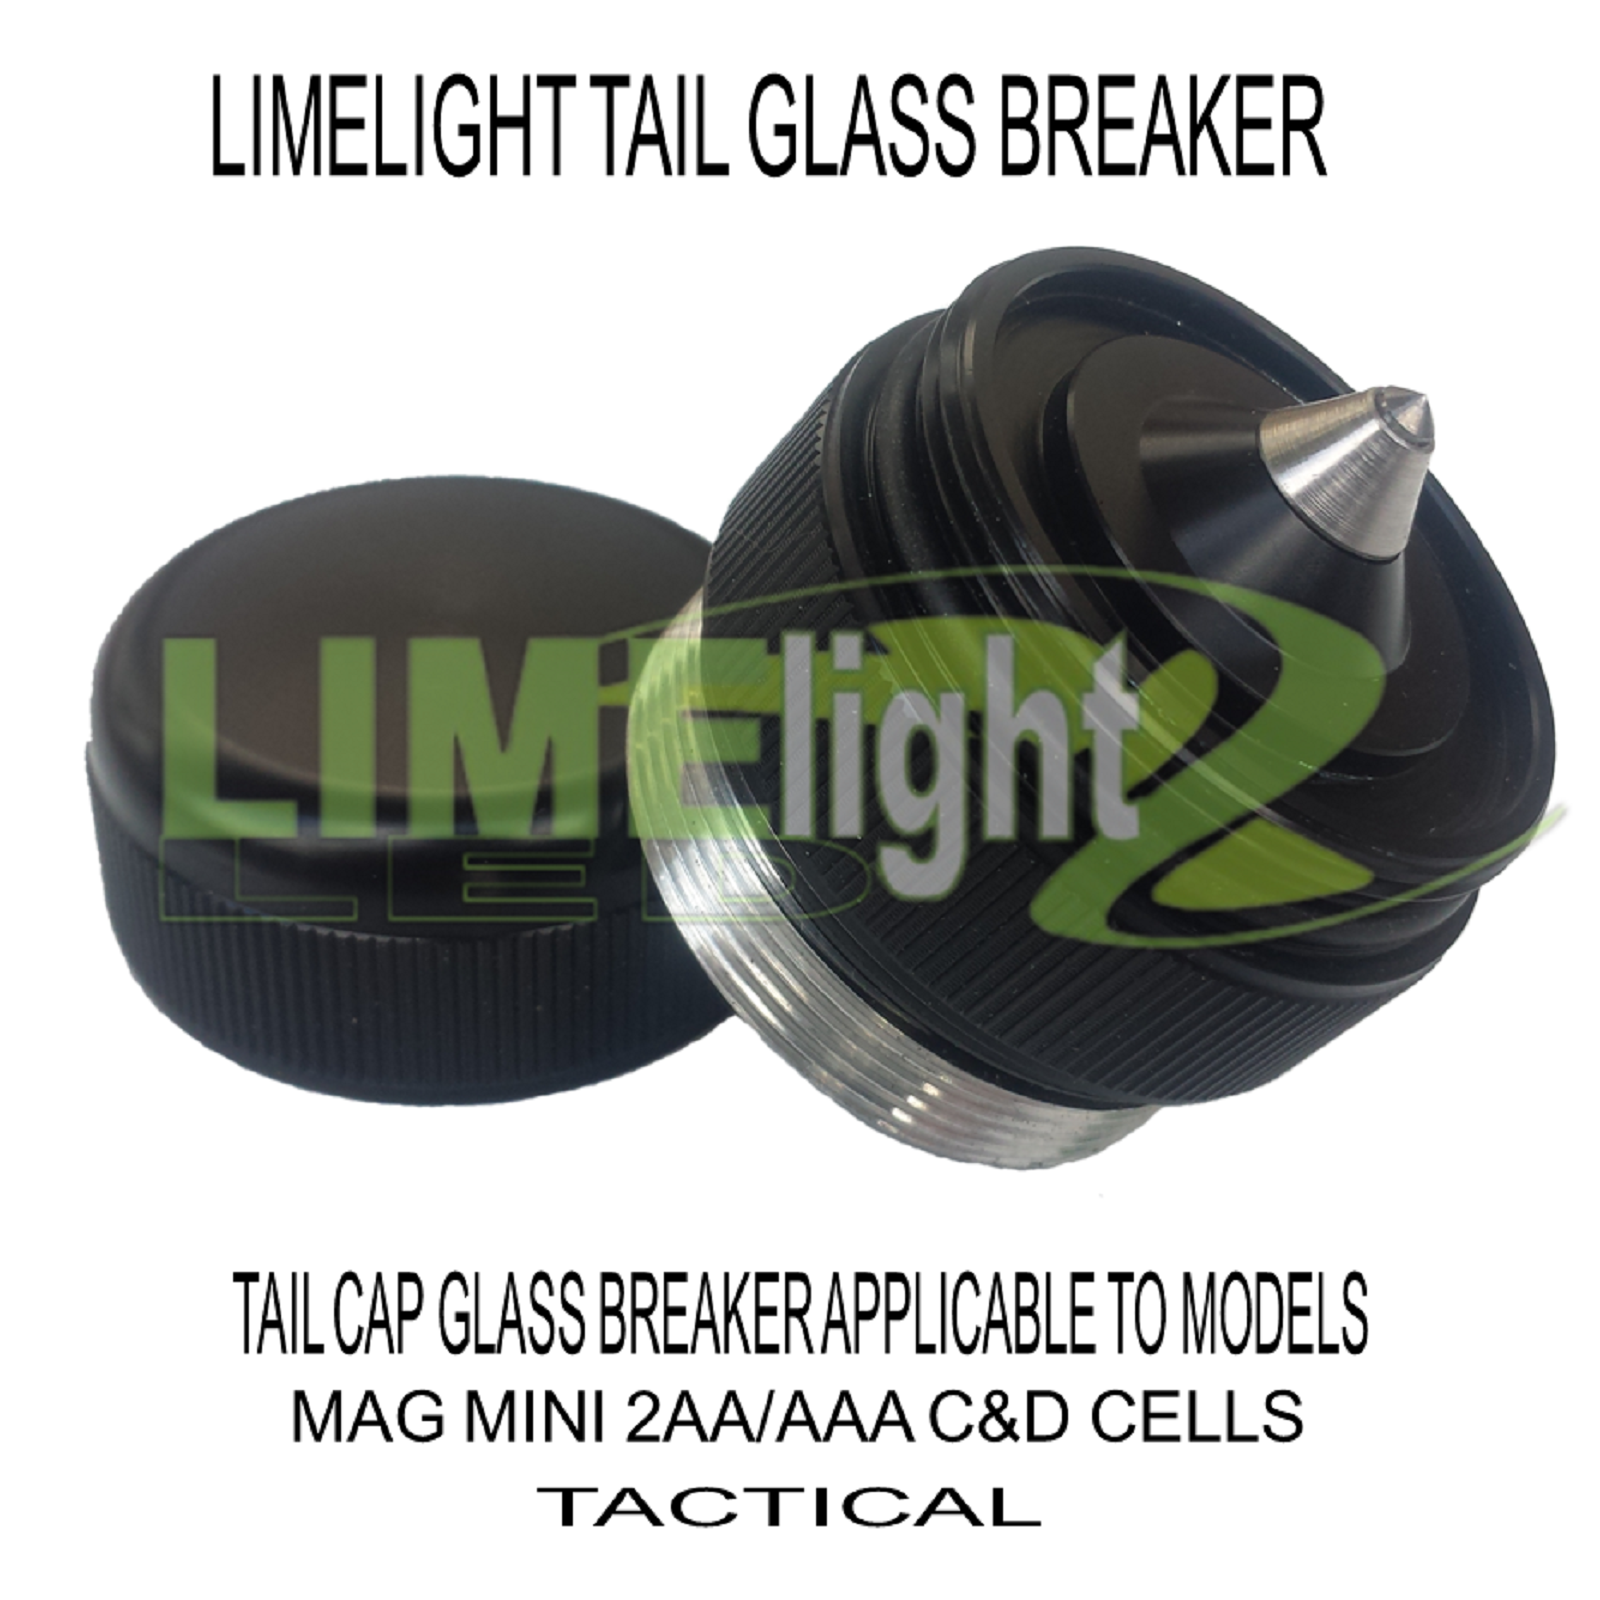 Maglite Led Upgrade Conversion Cree 1W-10W Bulb Globe Flashlight Torch 90-1100Lm 11